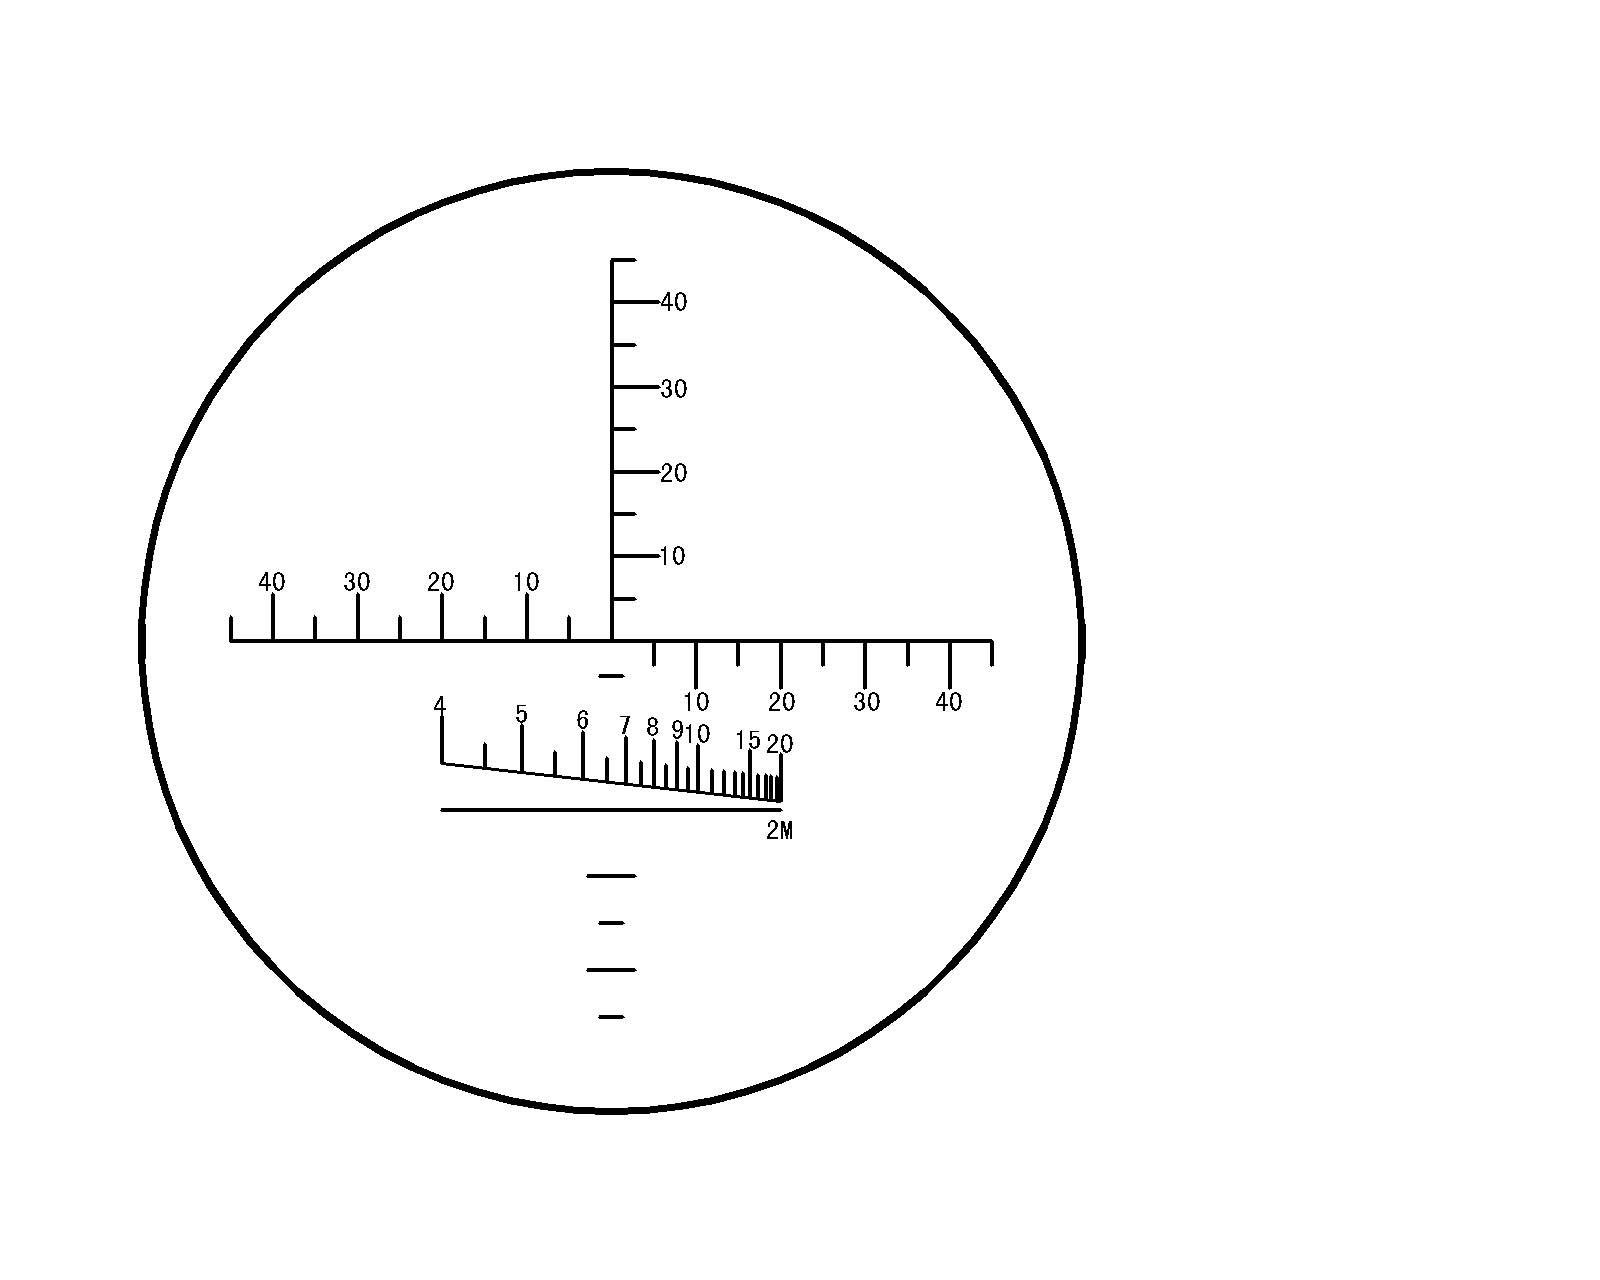 Visionking Fixed Focus Binoculars 10x50 With Buld In Reticle Range Finder Binocular Children